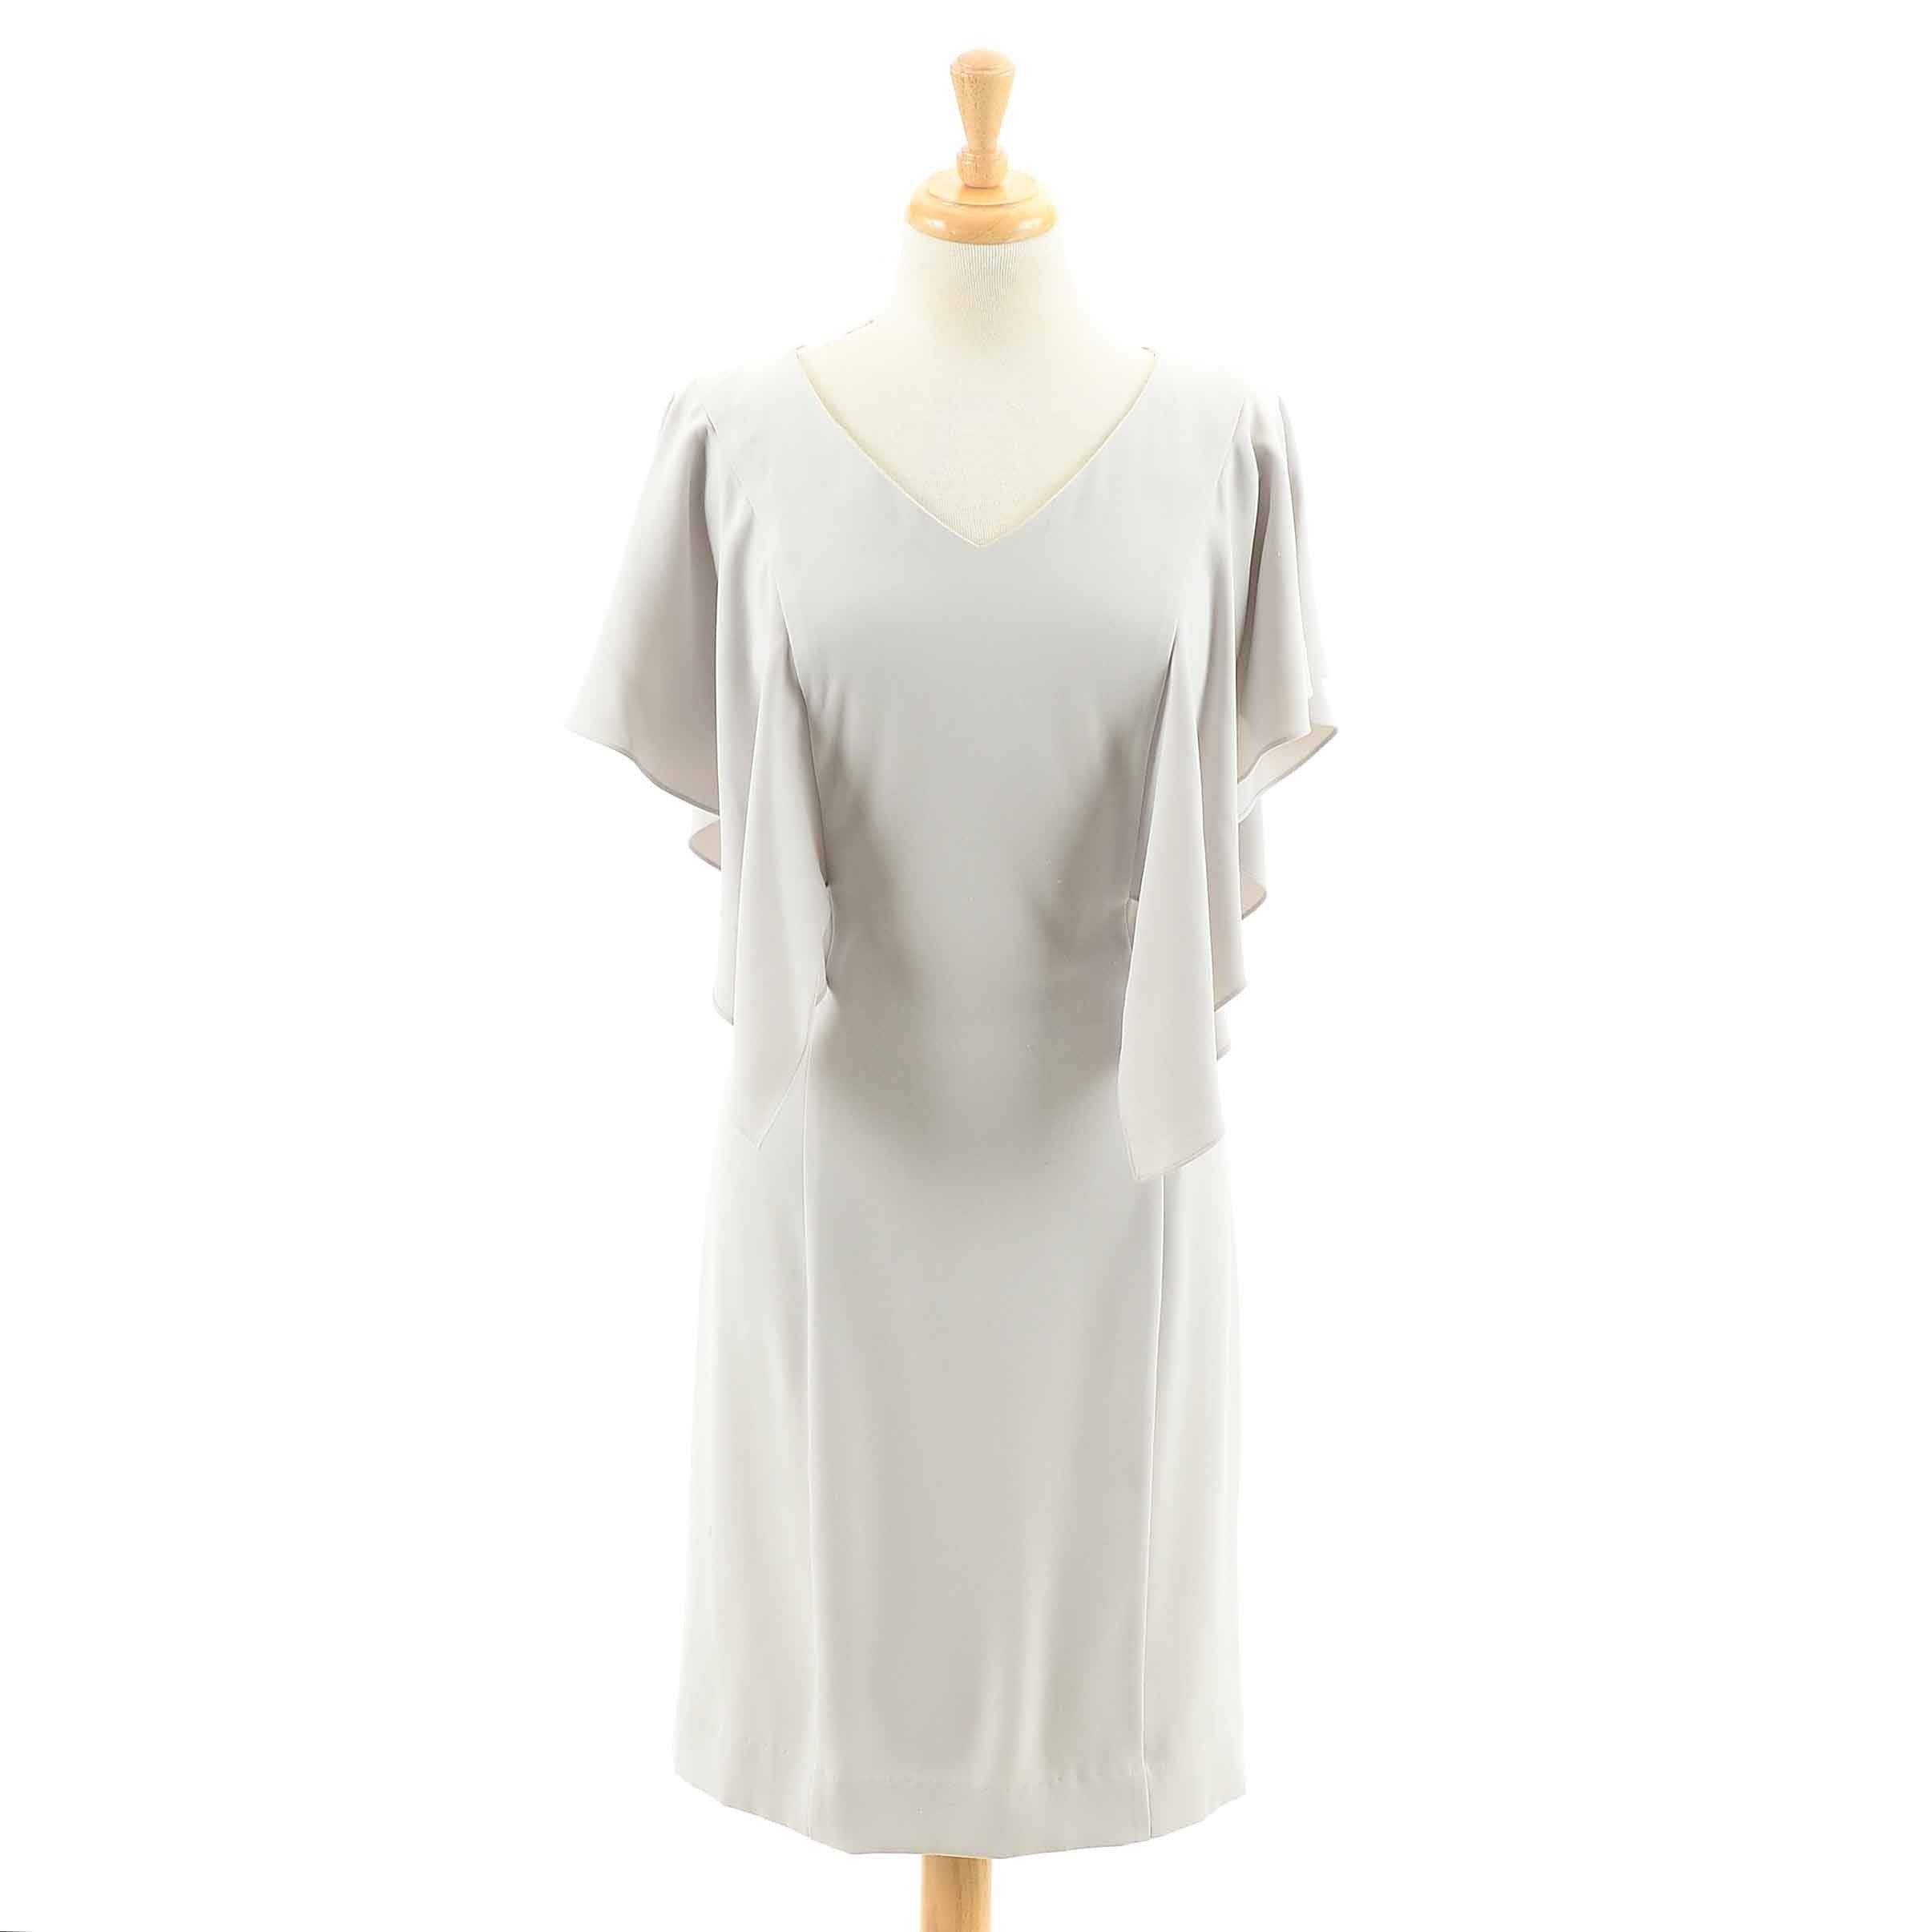 St. John Couture Dress